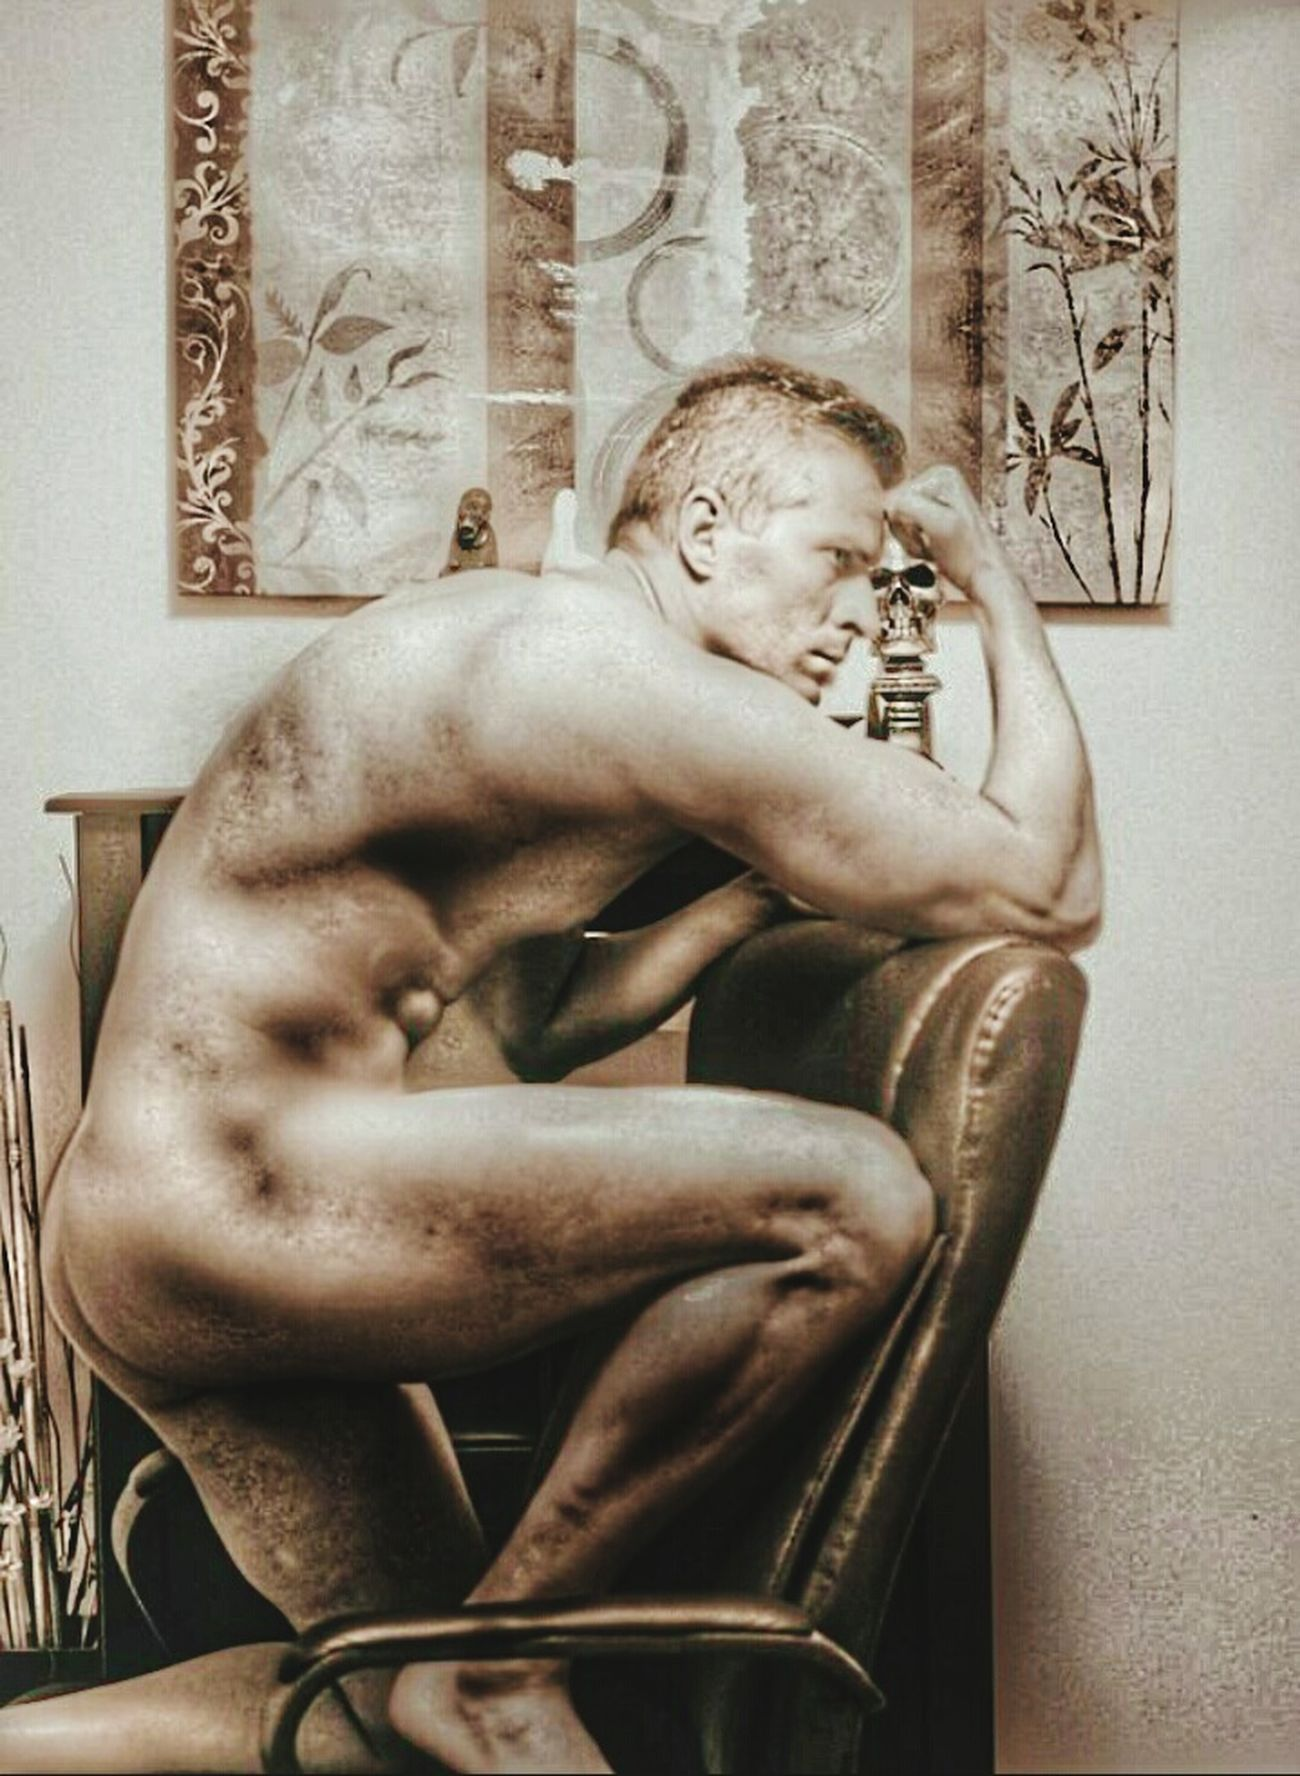 Malemodel  Hotsexymen Erotica